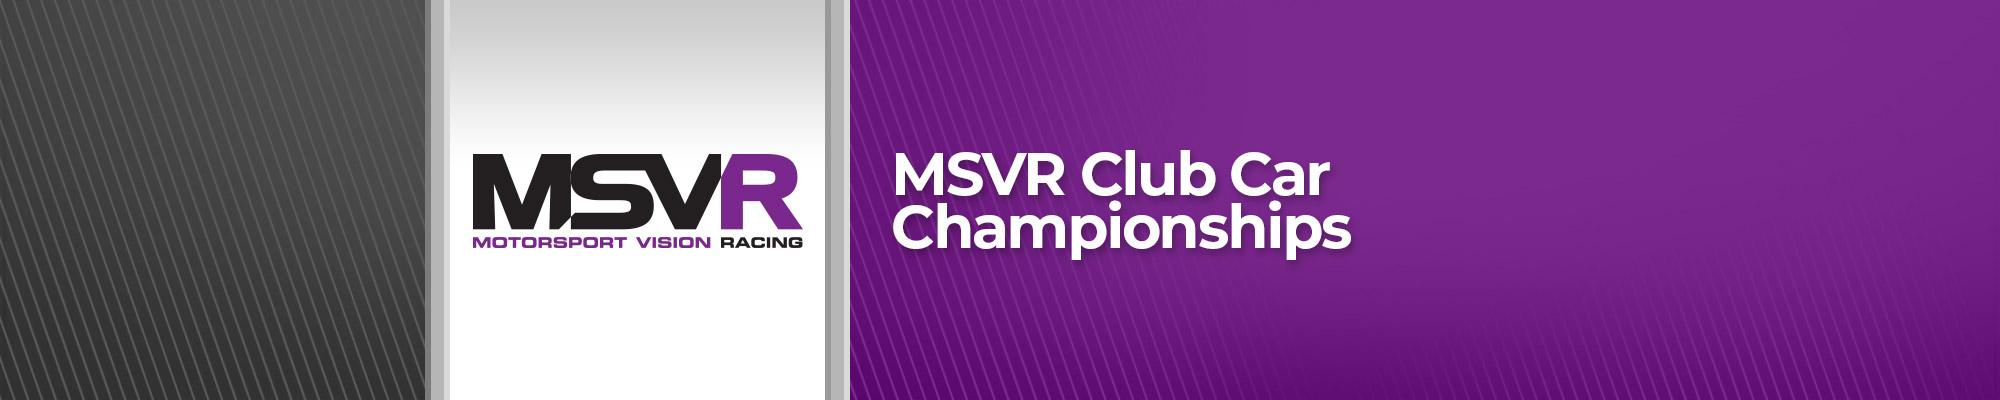 MSVR Club Car Championships